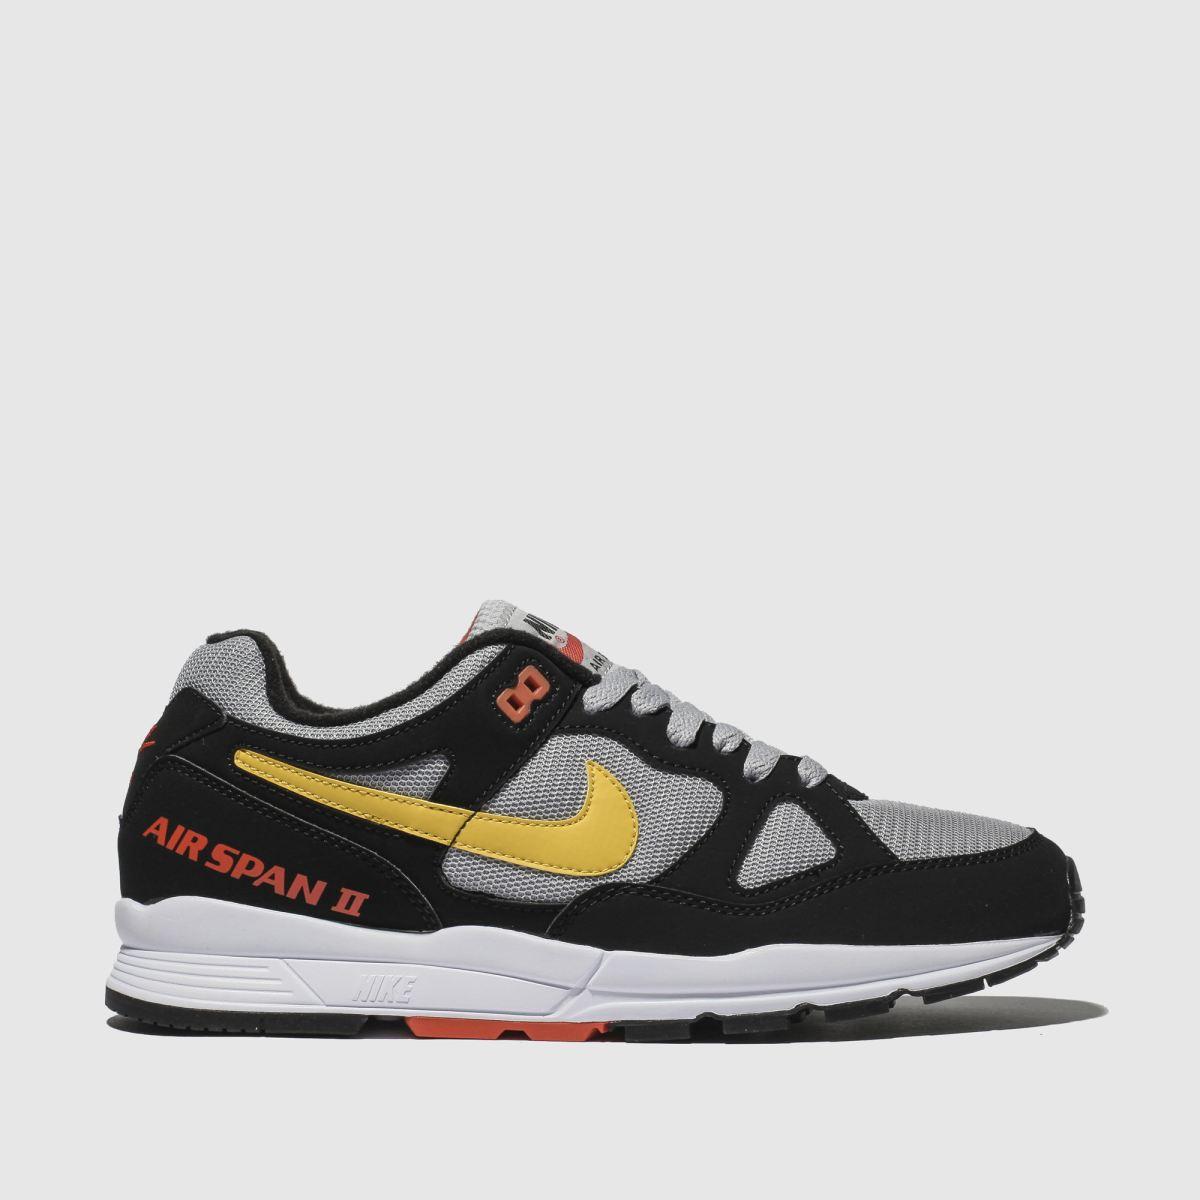 Nike Black & Grey Air Span Ii Trainers